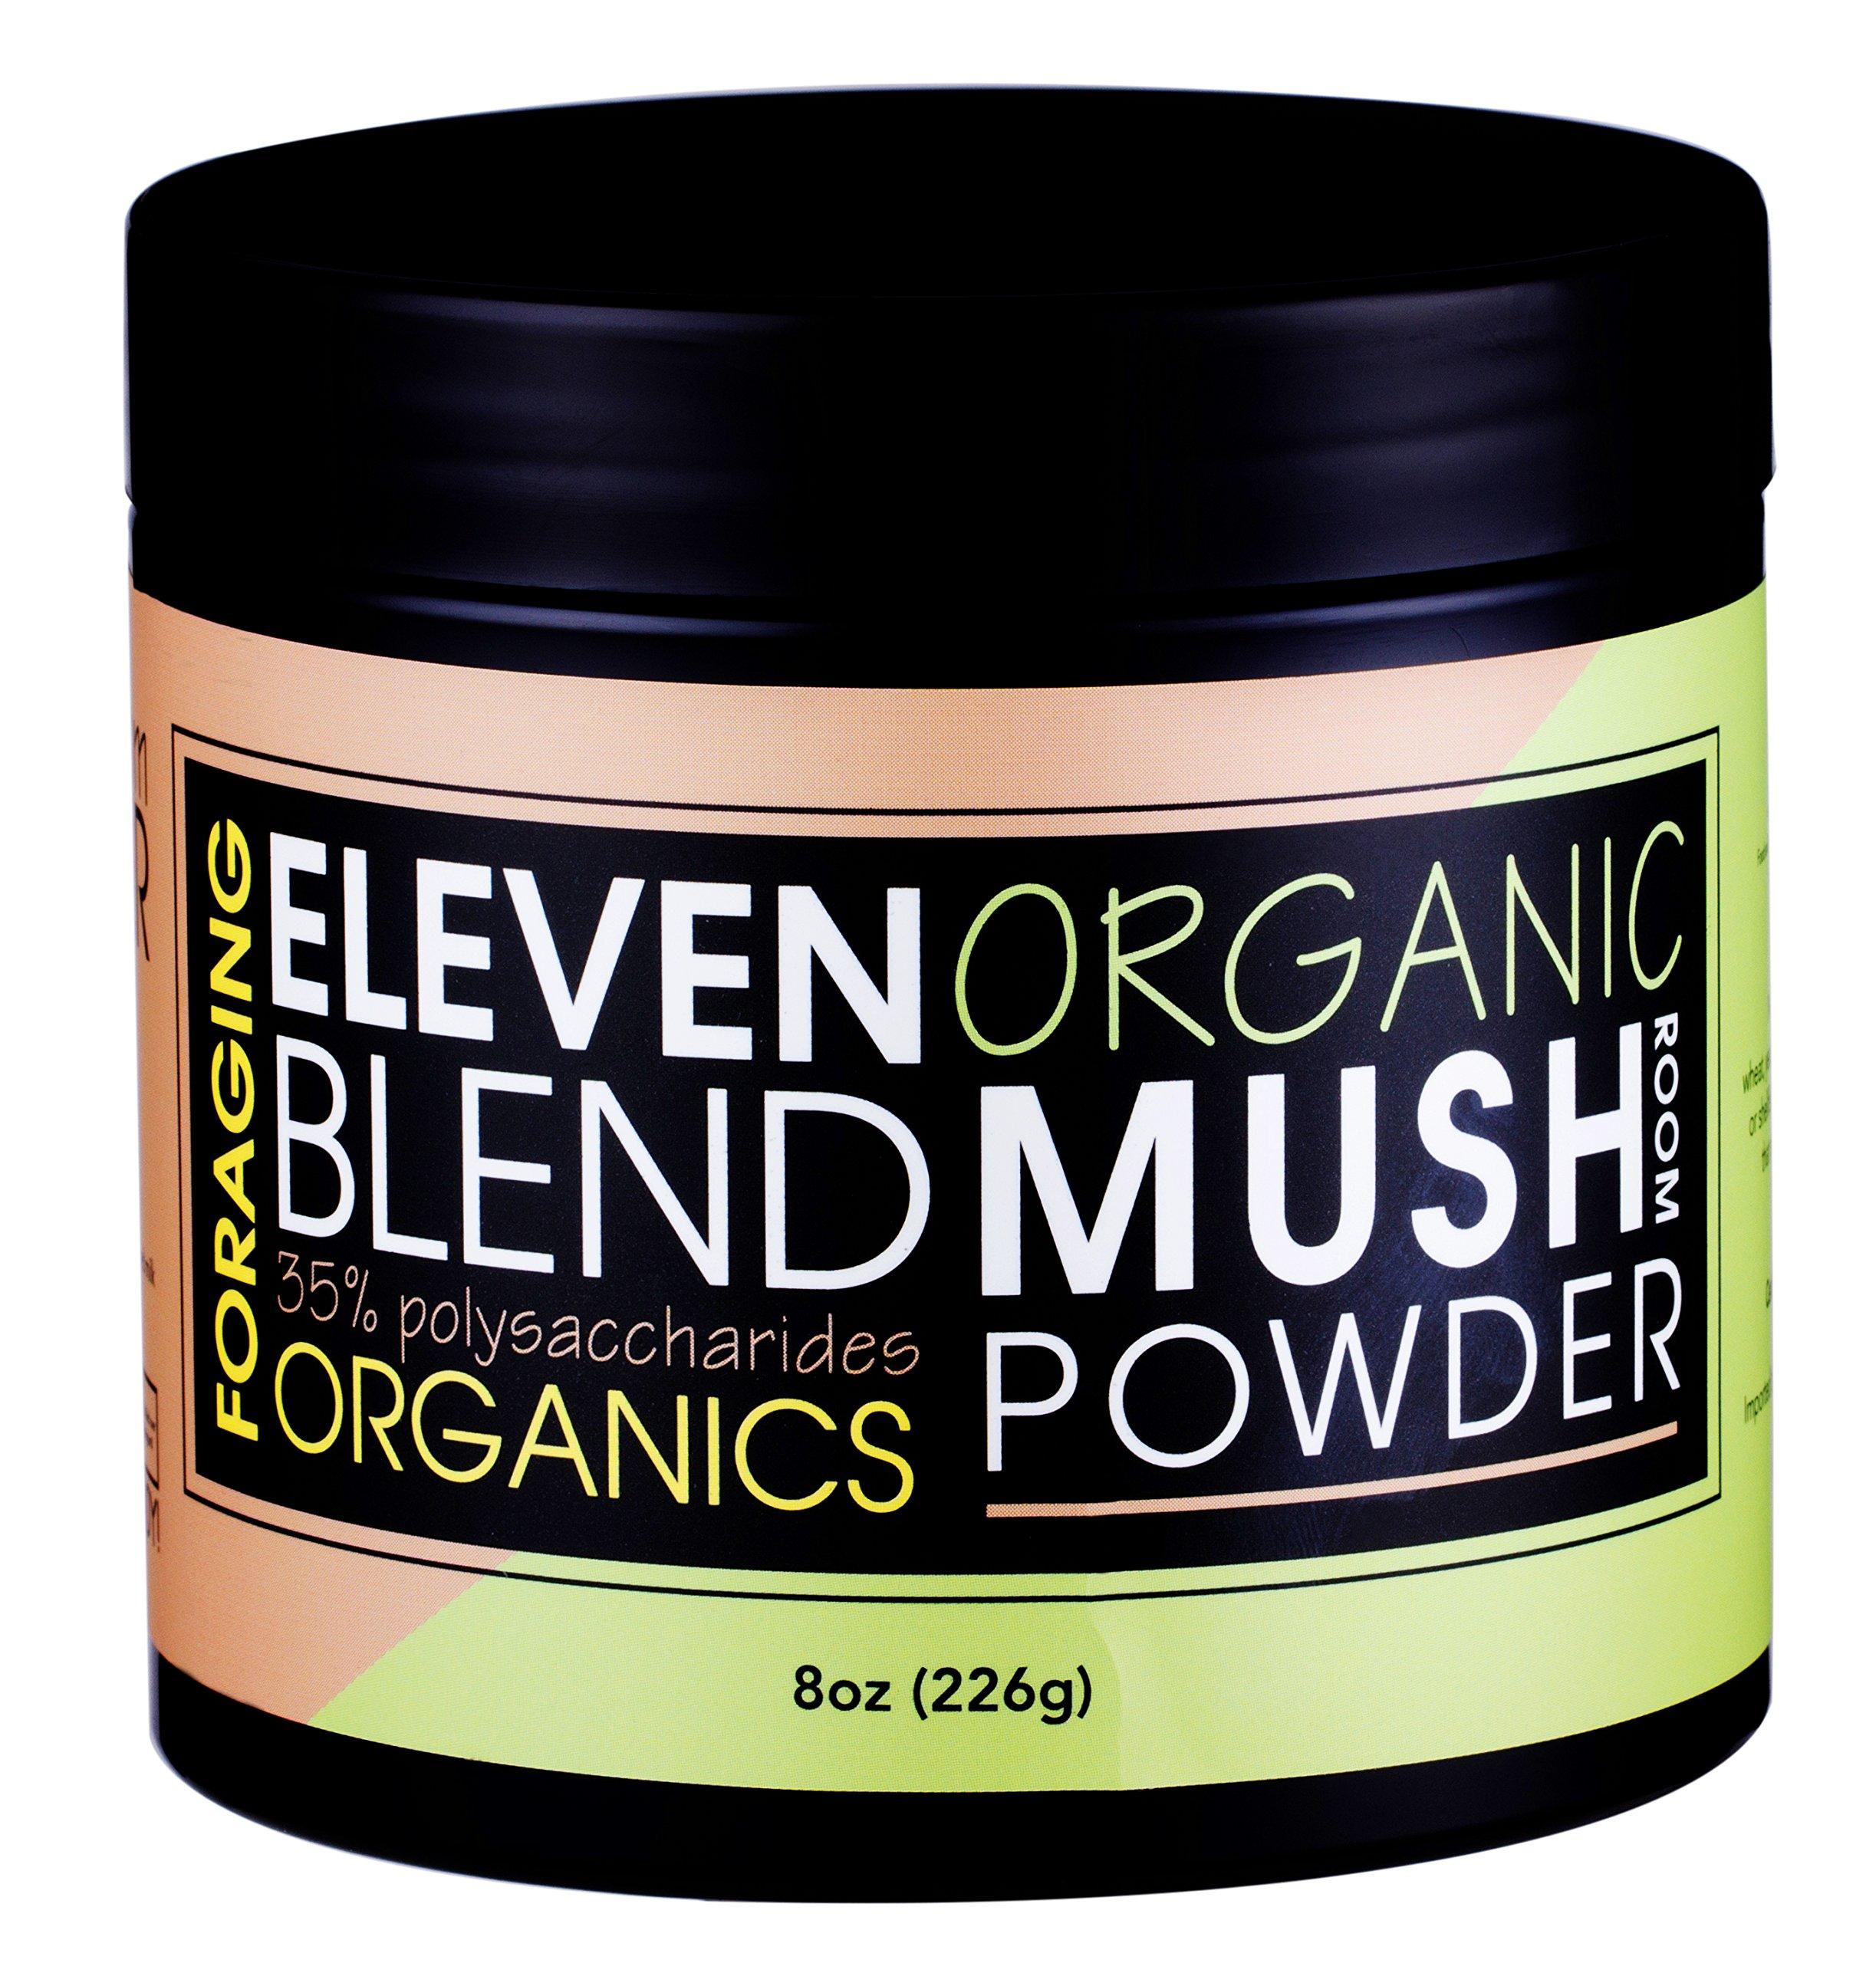 Foraging USDA Organic 11 Mushroom Extract Blend (8 oz) Powder For Coffee and Cooking 35% Polysaccharides, Red Reishi, Chaga, Lions Maine, Shiitake, Enoki And More